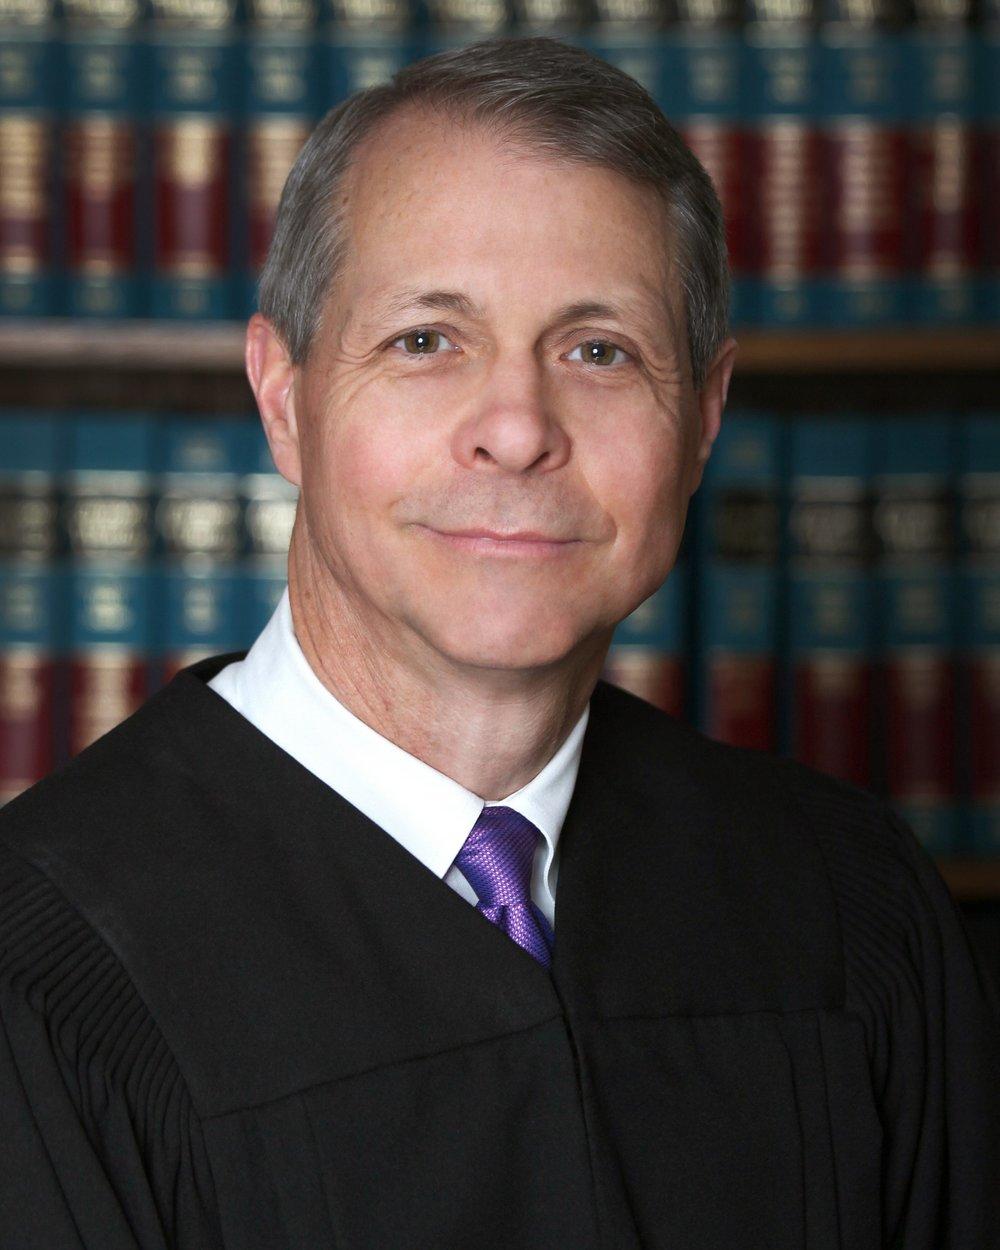 HON. JUDGE JEFFREY C. MARTIN